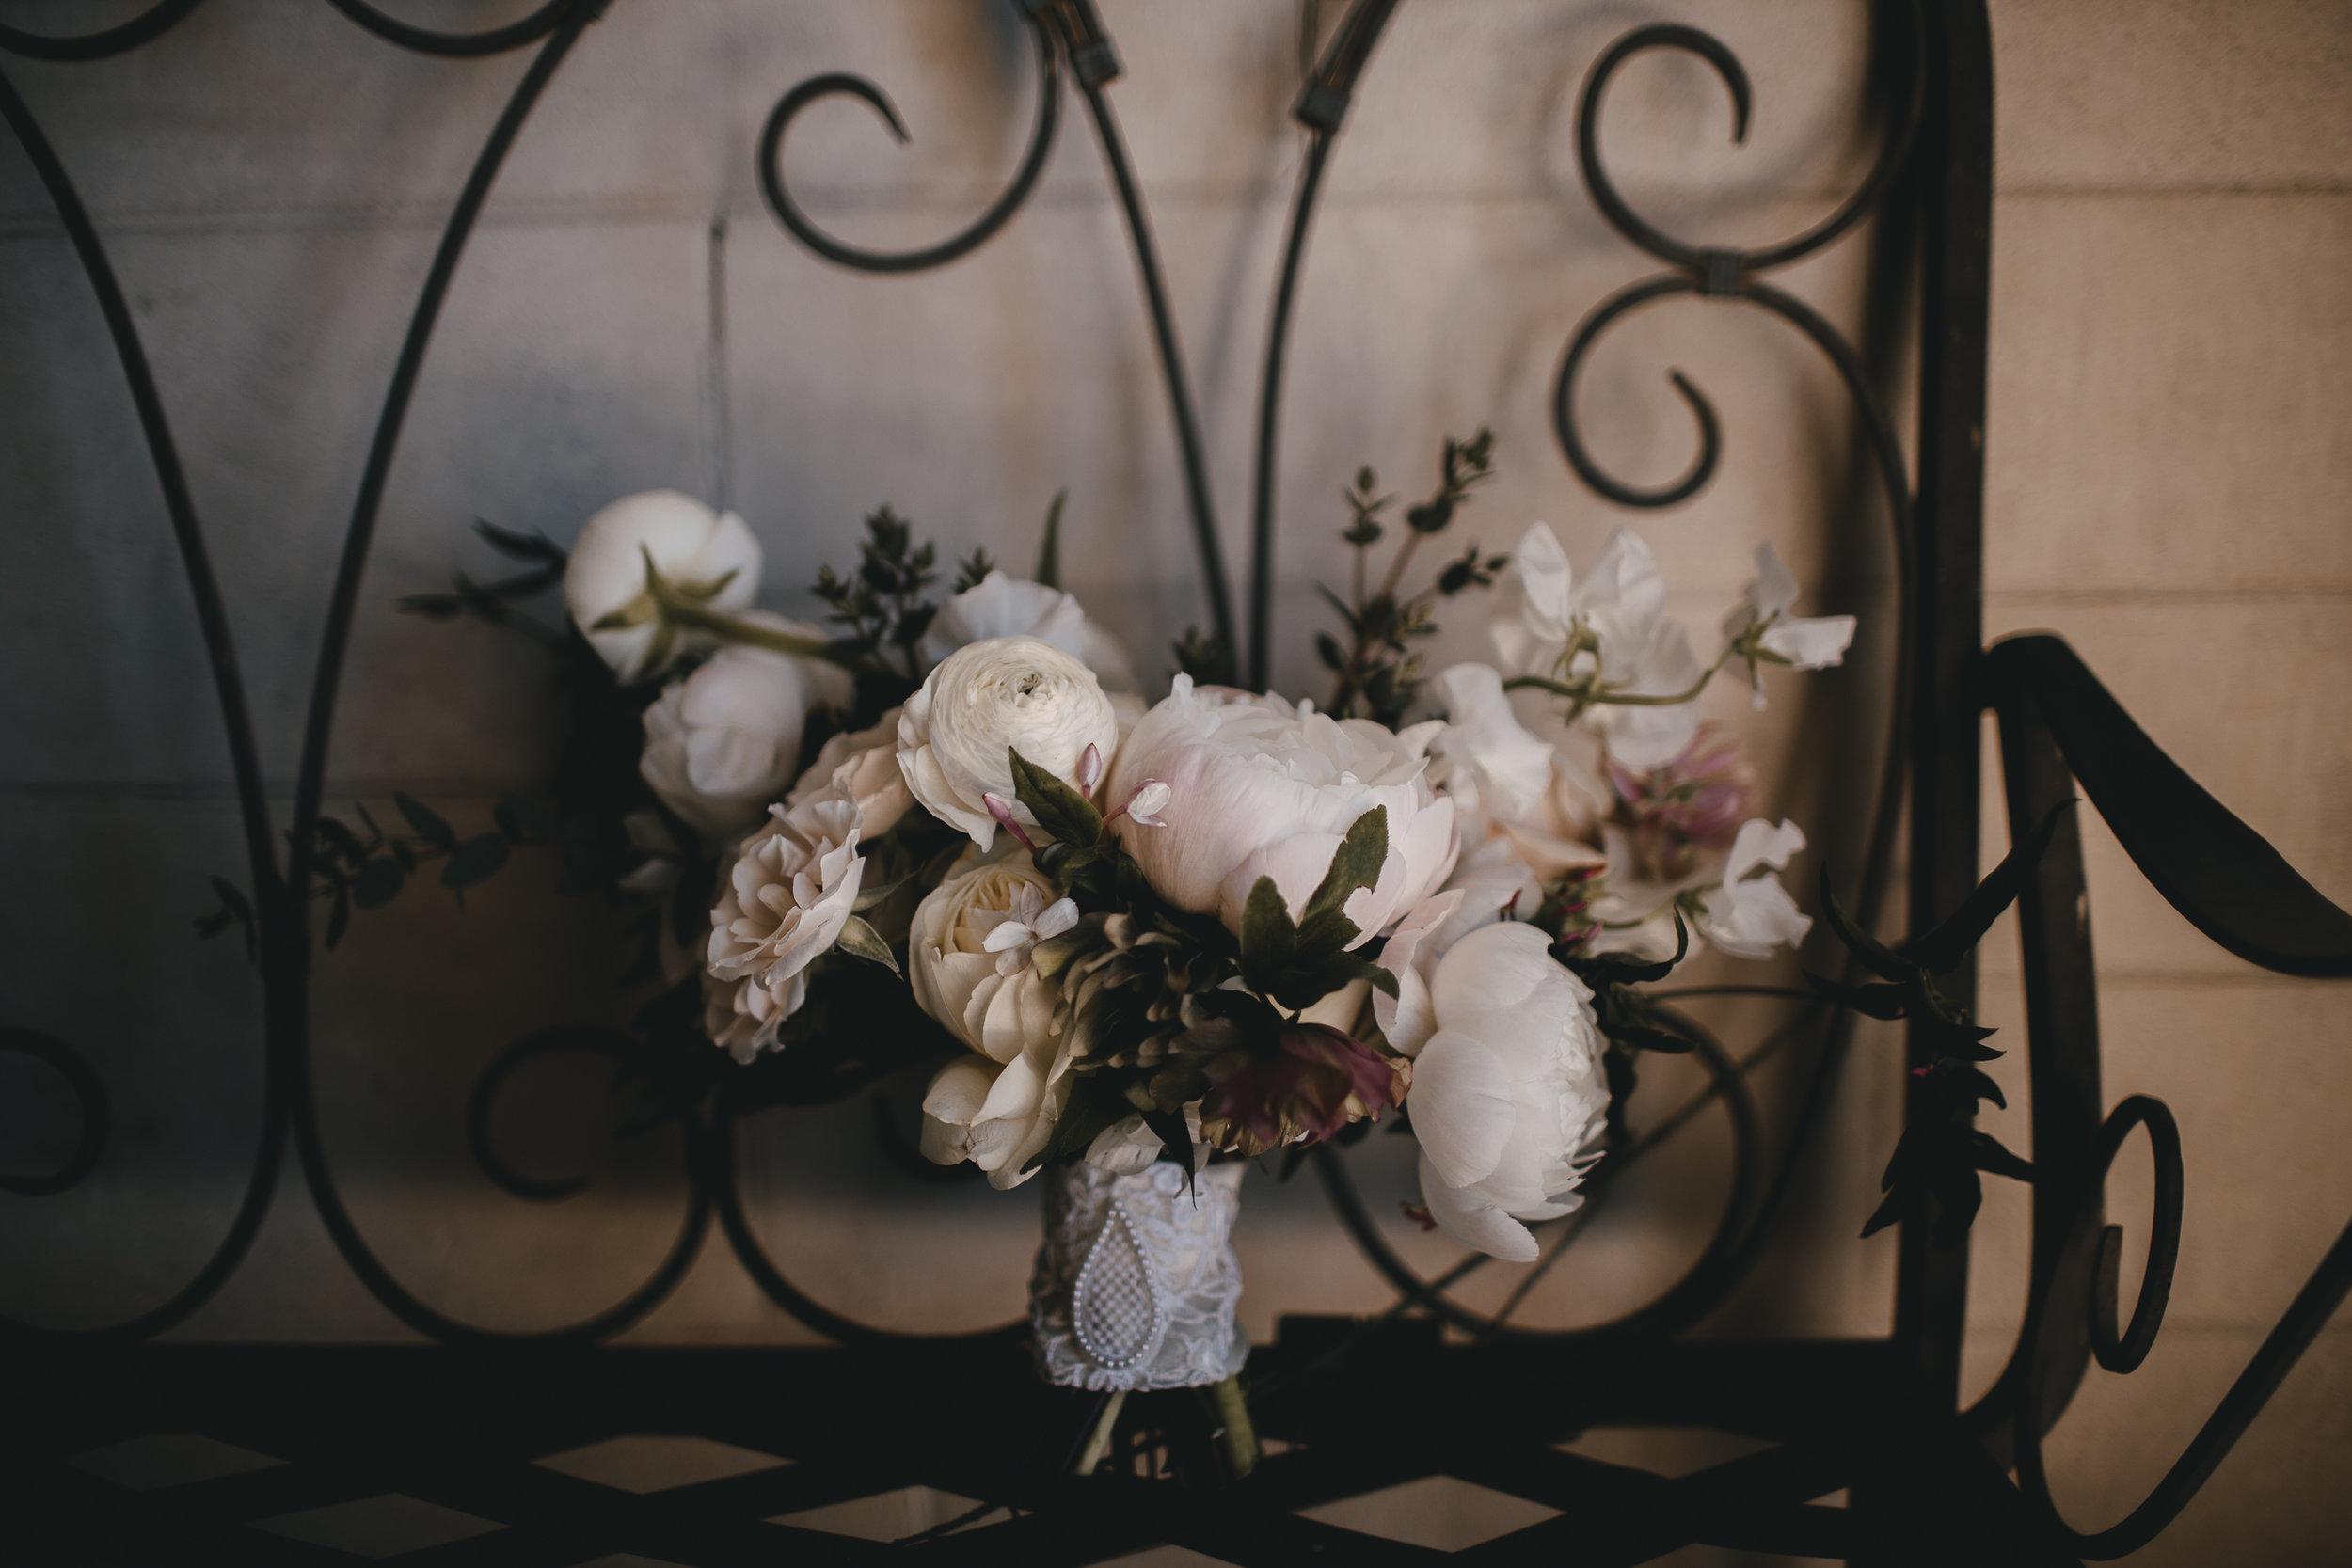 carolandgrahamwedding-139.jpg